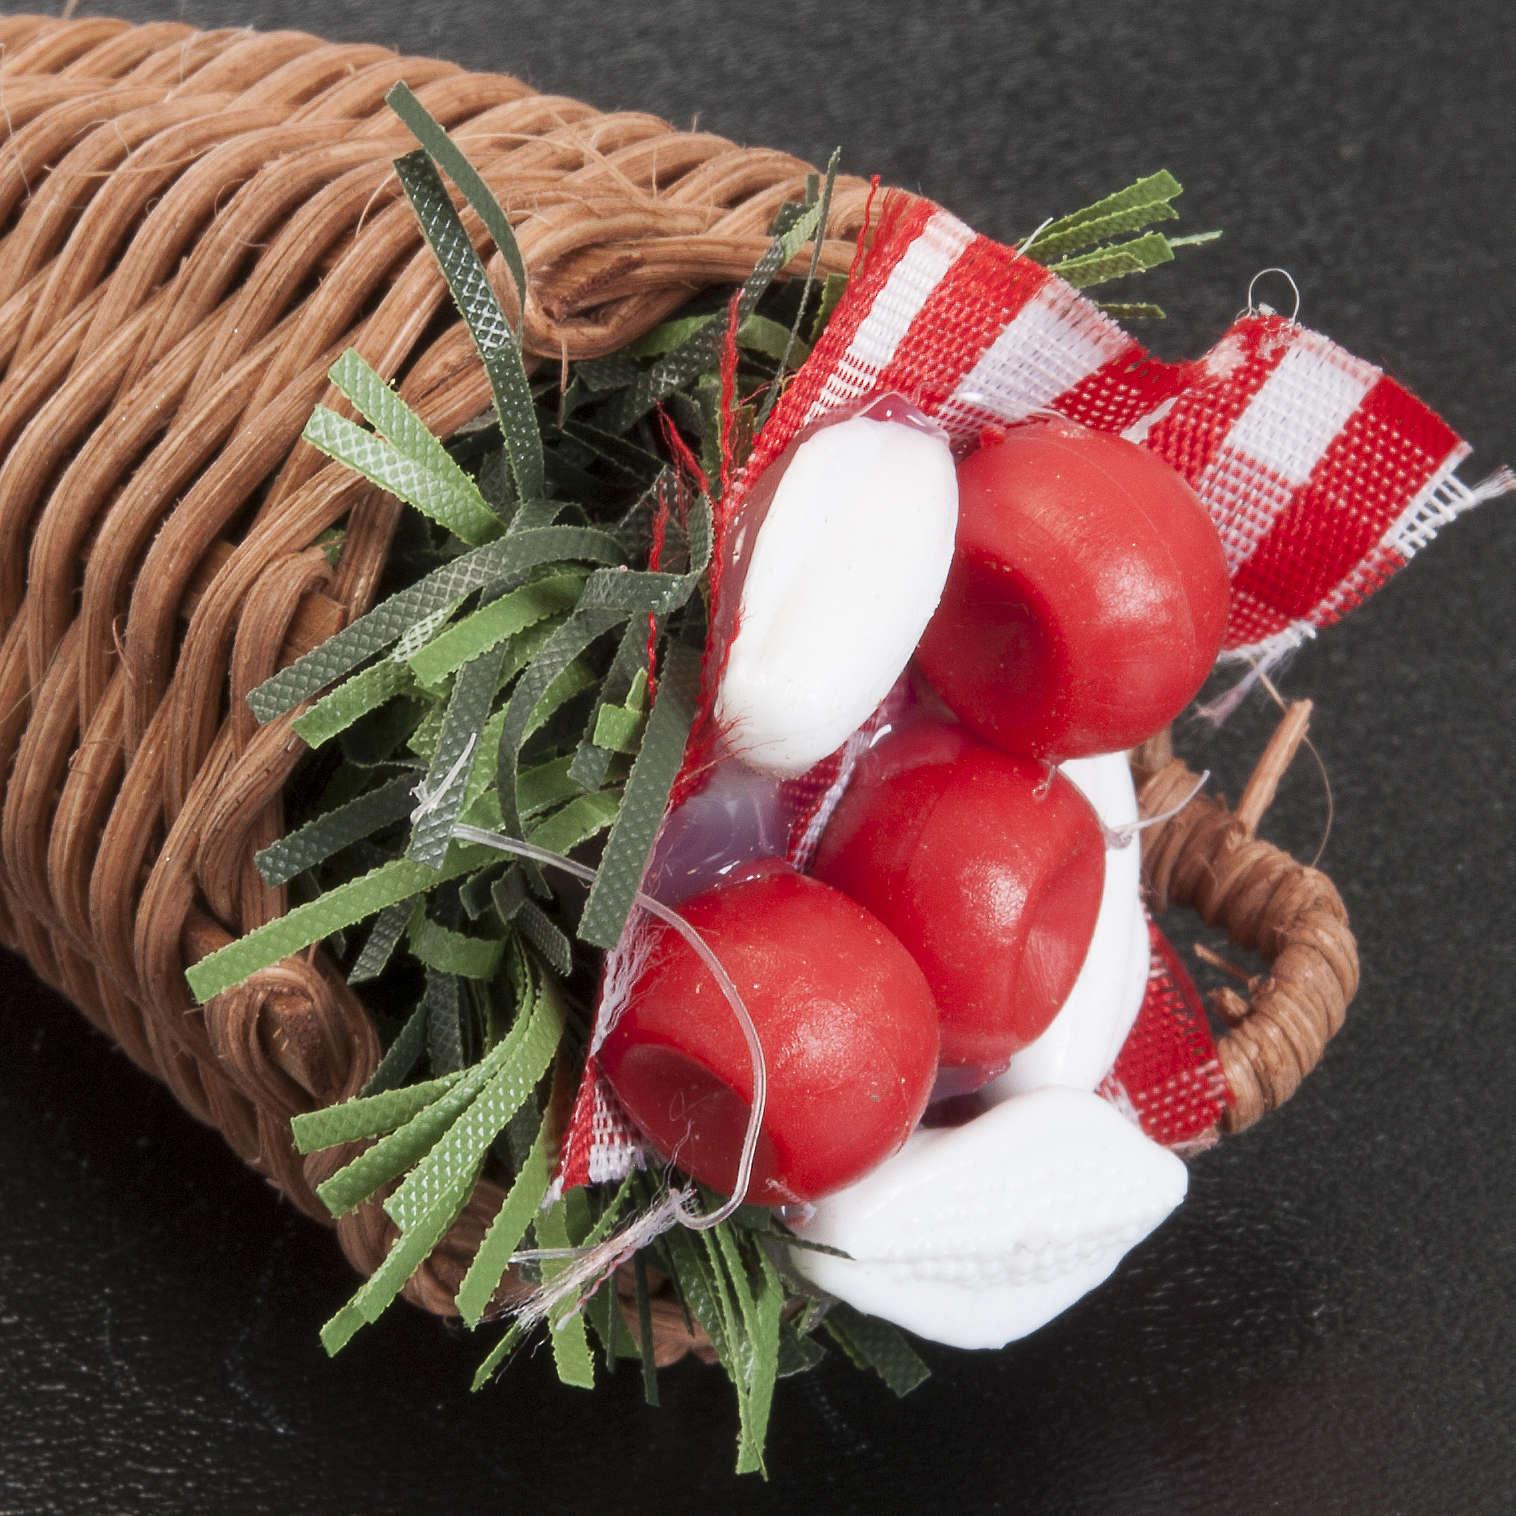 Nativity scene accessory, vegetable basket 4